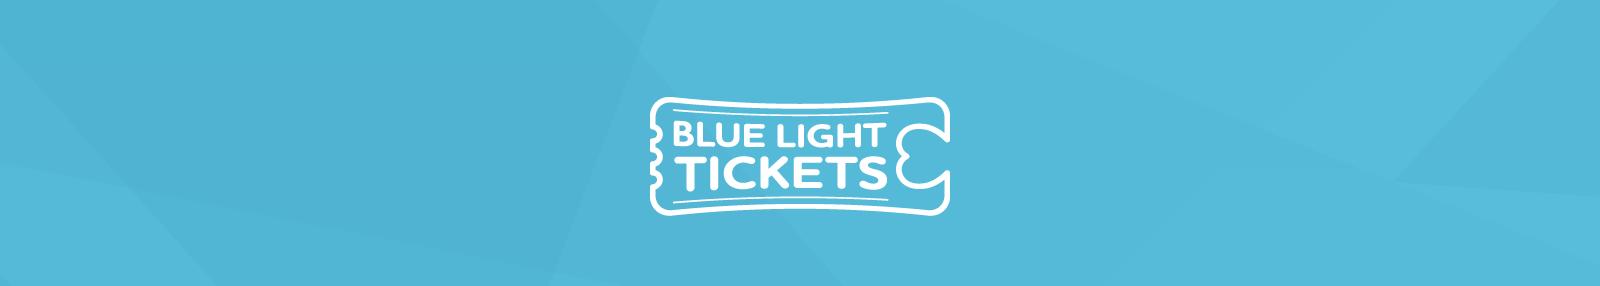 Blue Light Tickets - Free Event Tickets